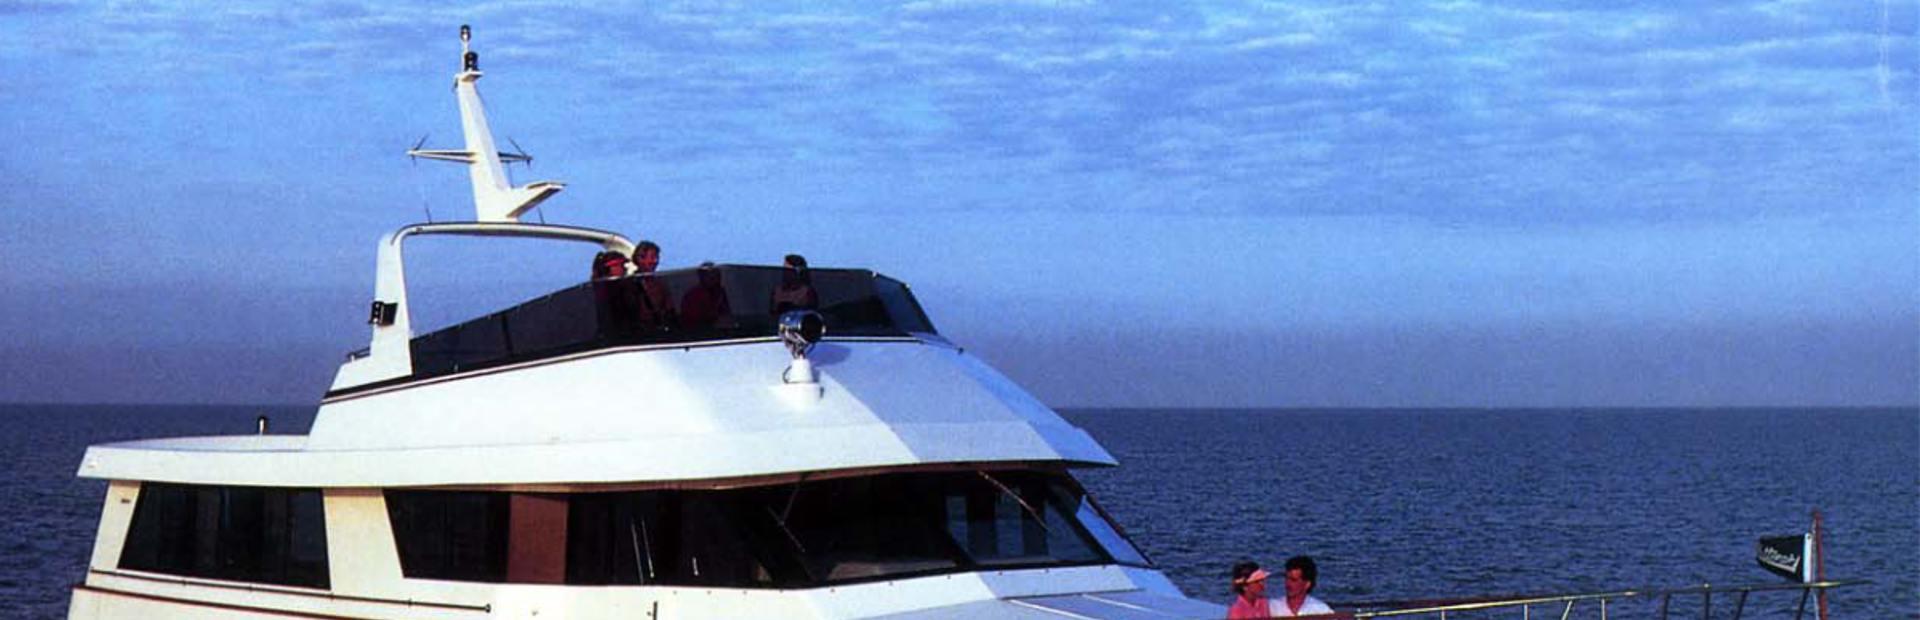 Hatteras 65 Motoryacht Yacht Charter